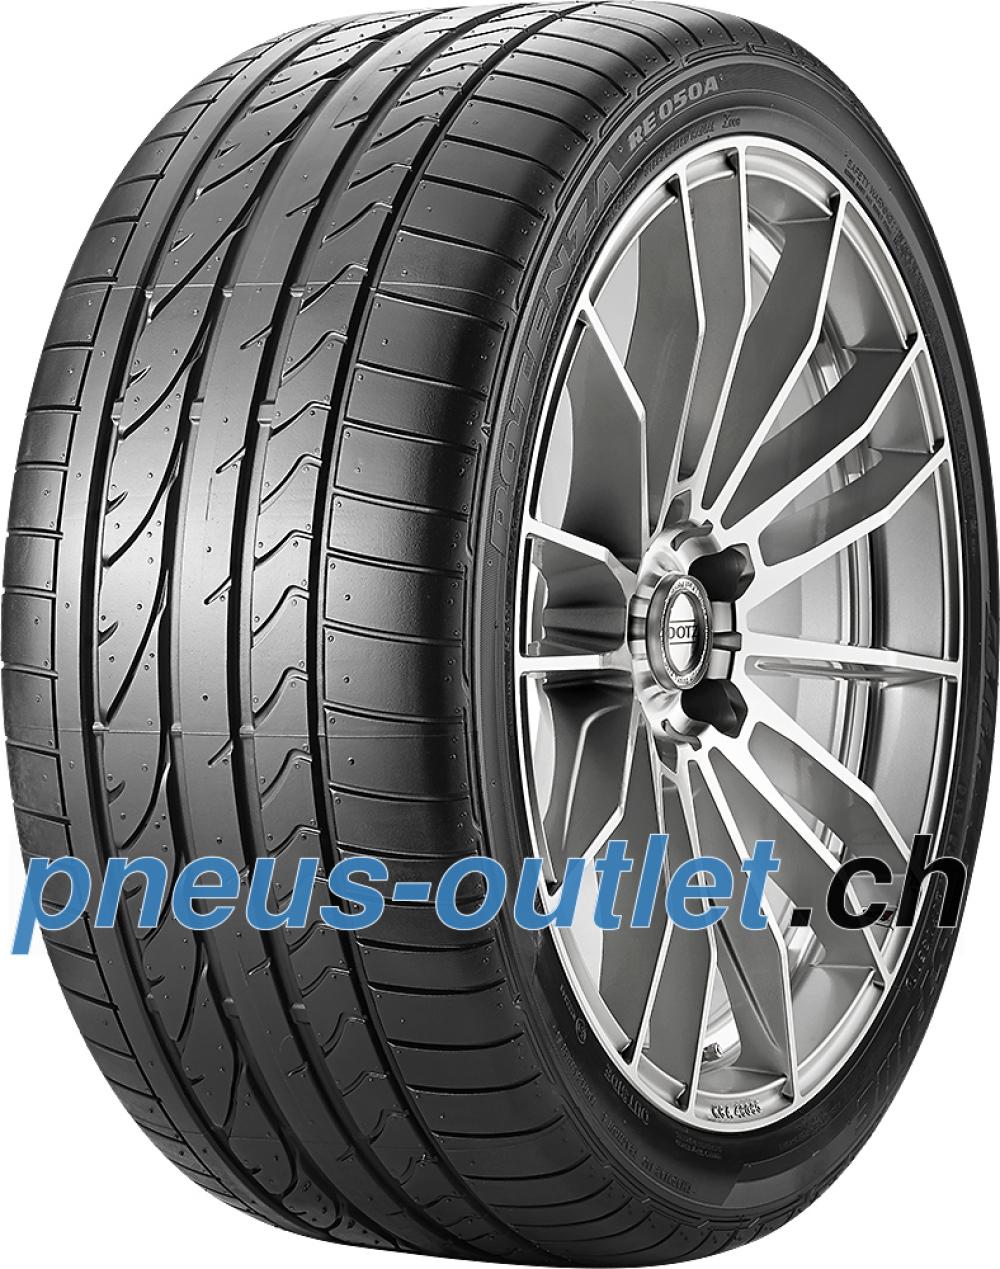 Bridgestone Potenza RE 050 A RFT ( 245/35 R18 88Y runflat, *, avec protège-jante (MFS) )